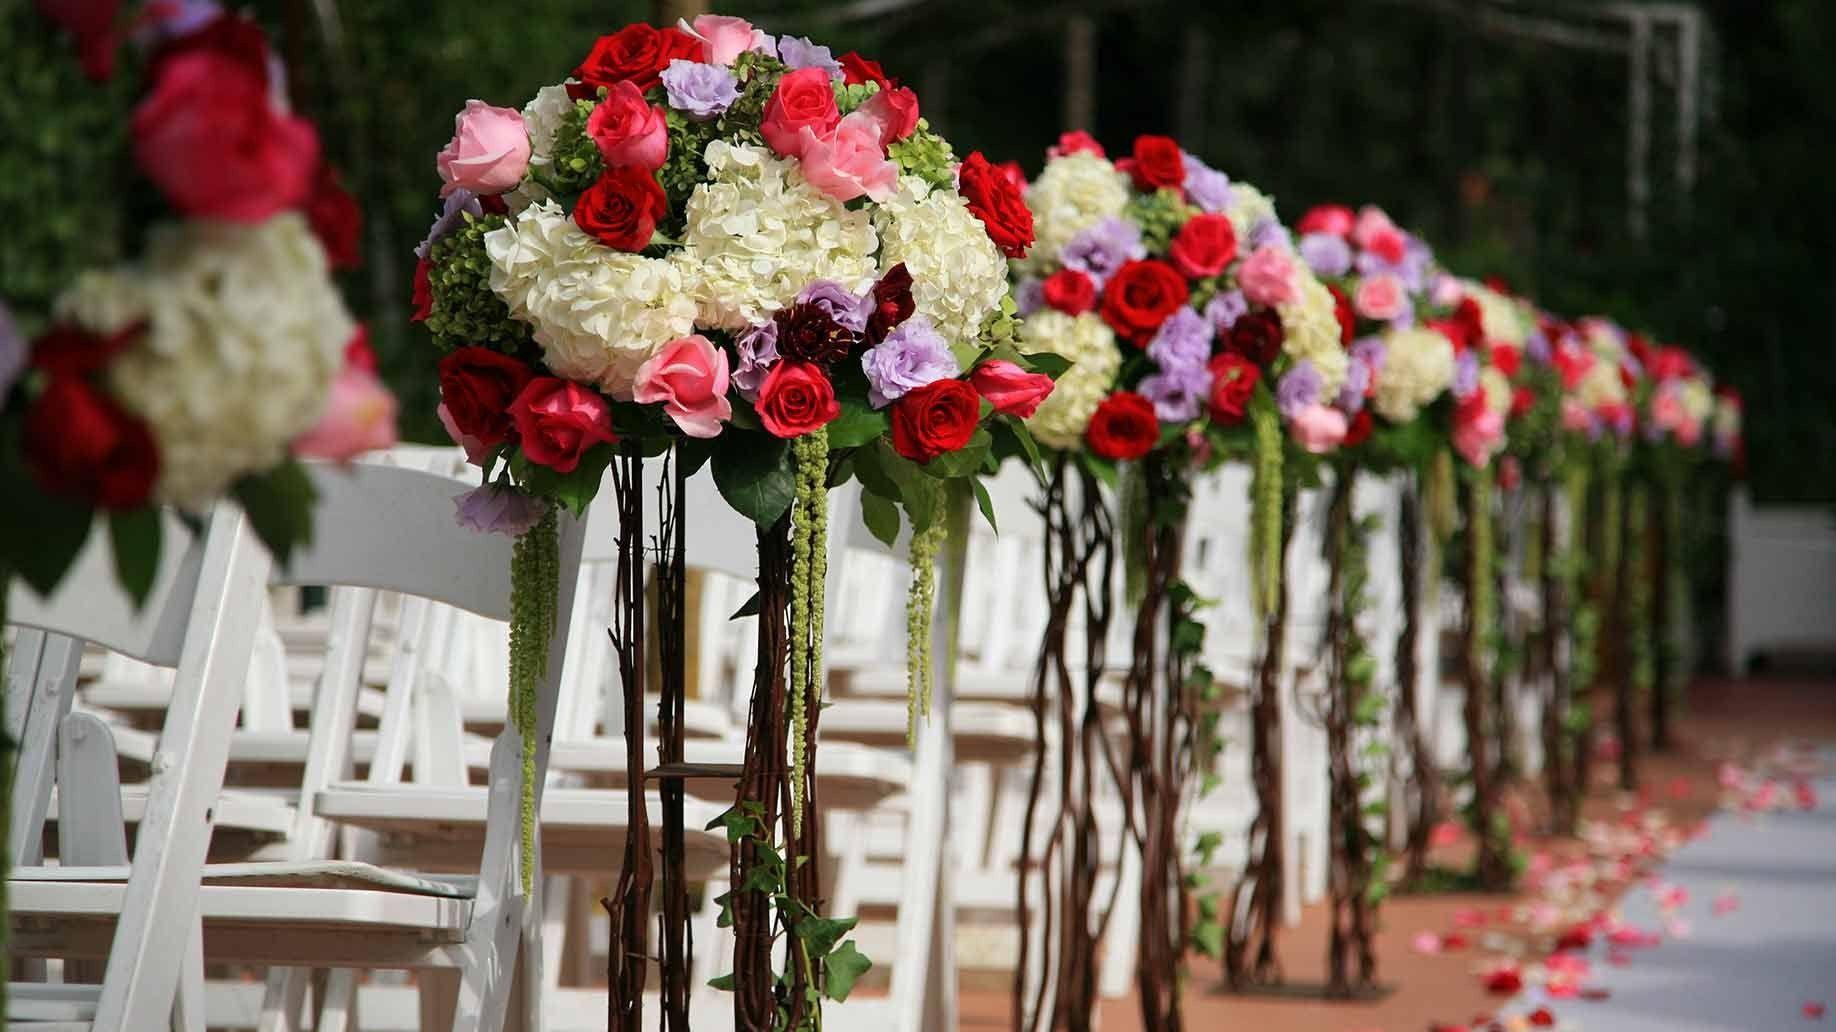 Beautiful Wedding Fl Arrangement Prices Https Www Flwedding Site